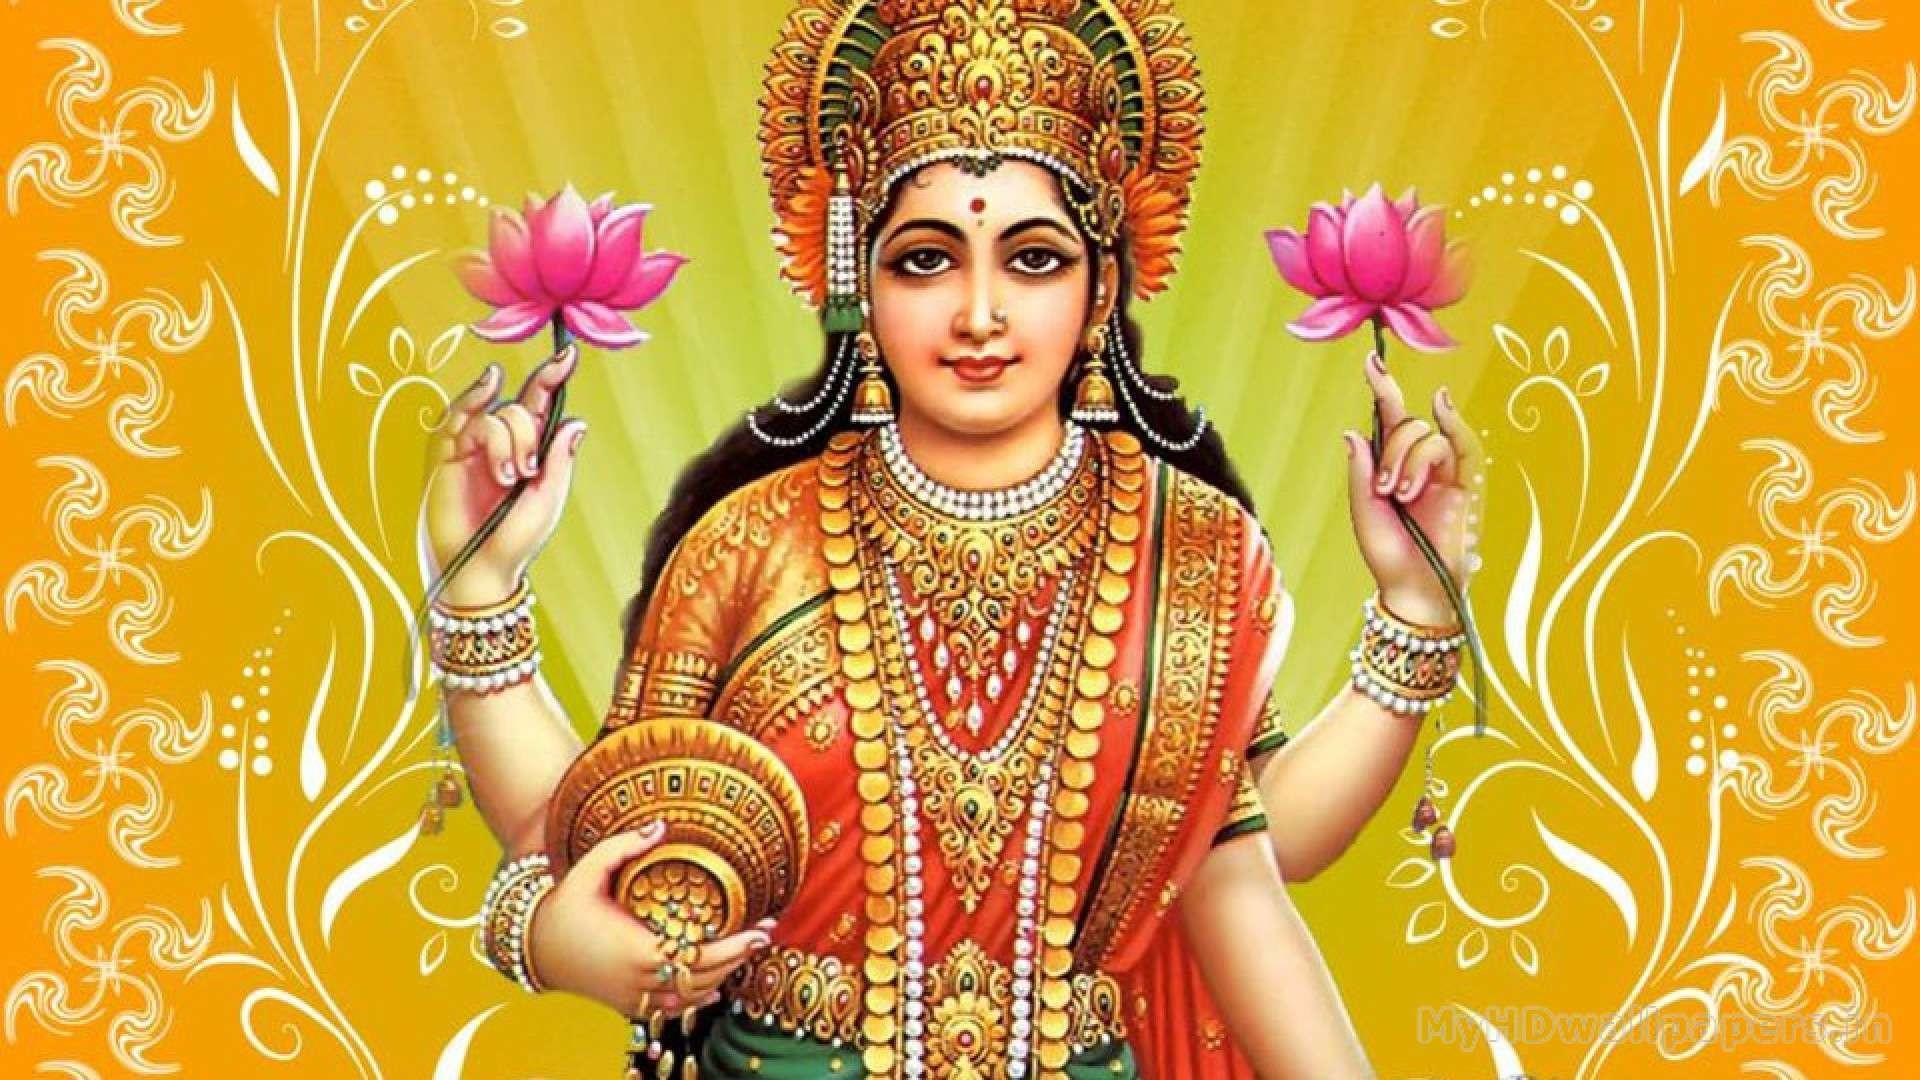 Tamil God Wallpapers Wallpaper Cave